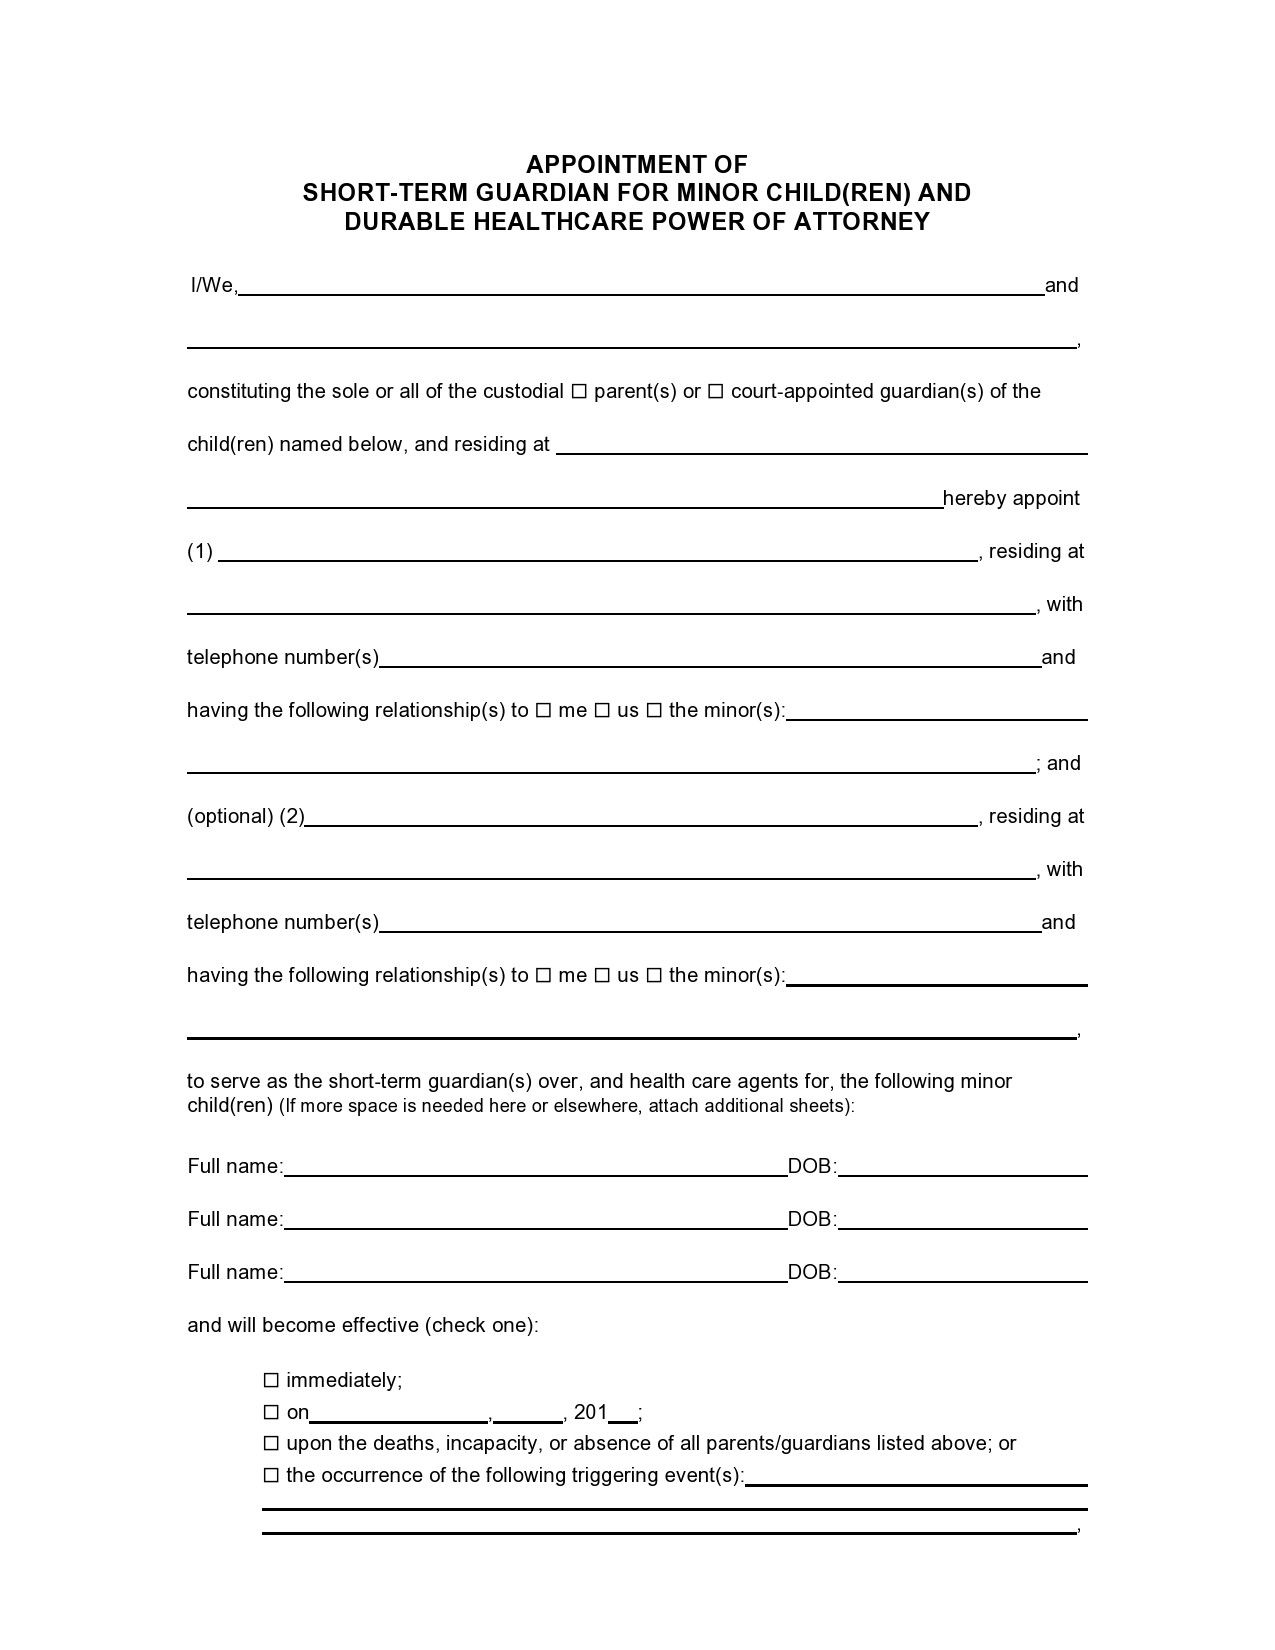 Free temporary guardianship form 25